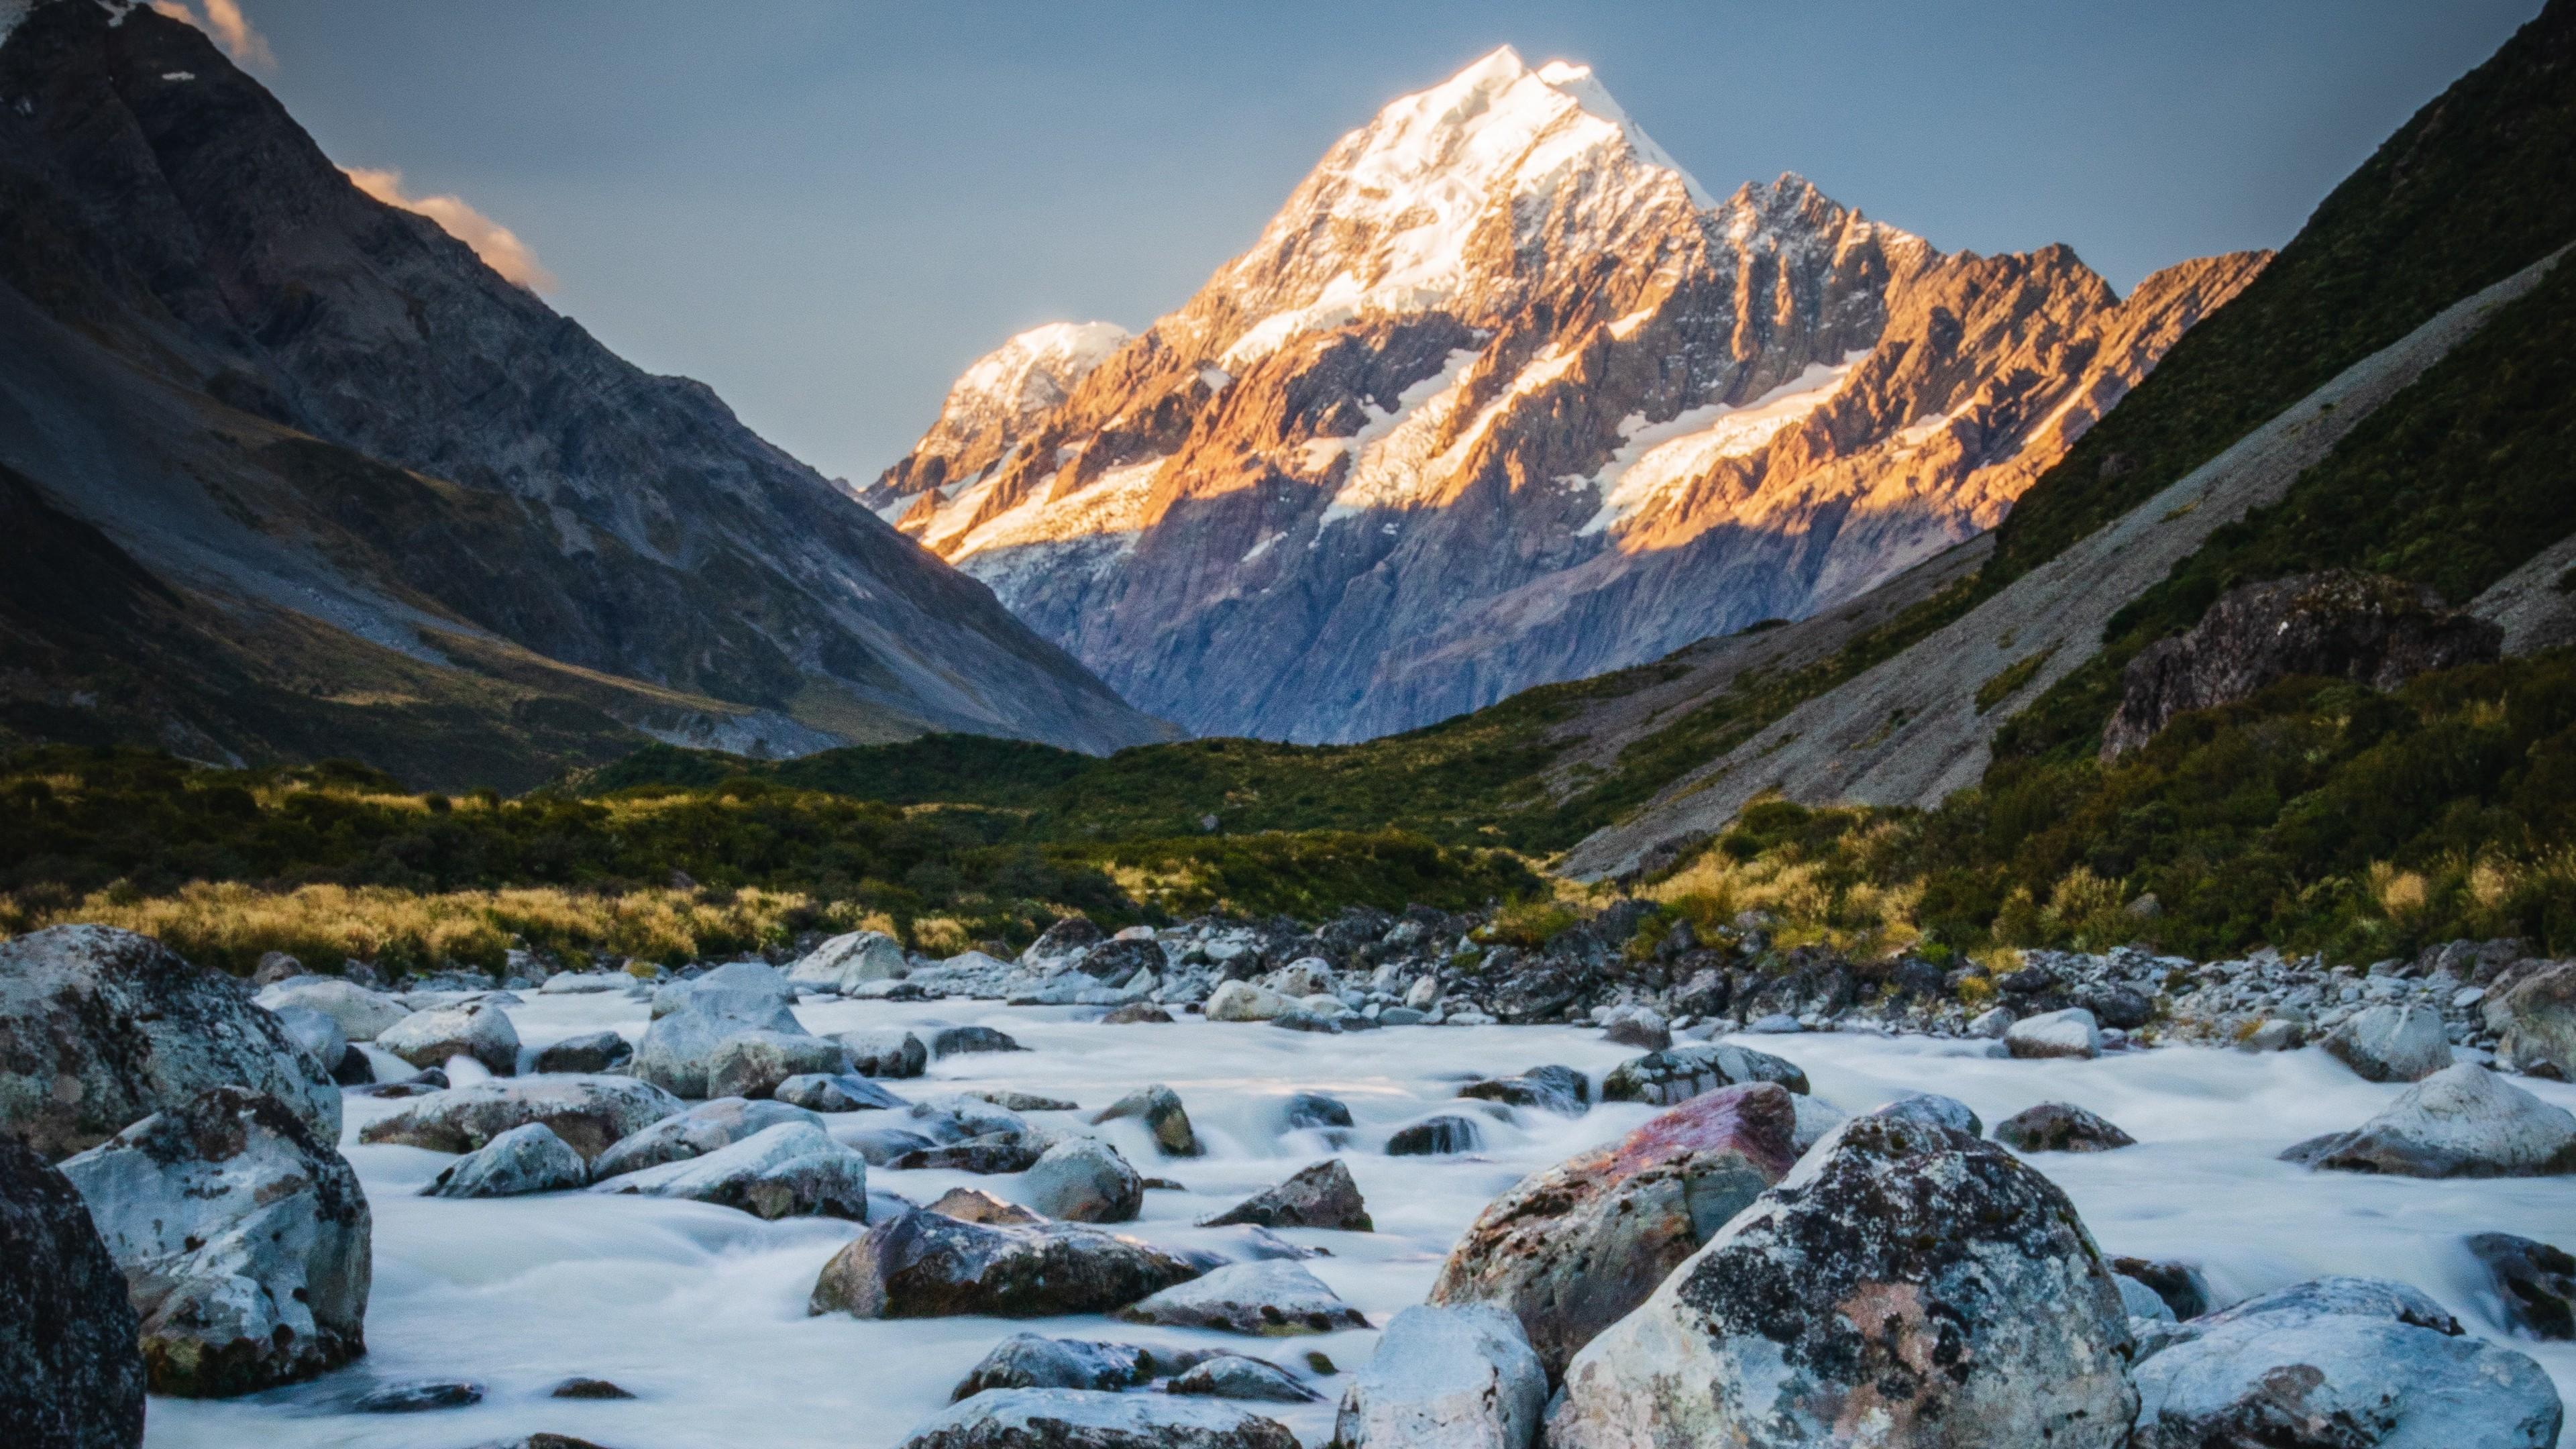 4k Mountains River Stones Wallpaper 3840x2160